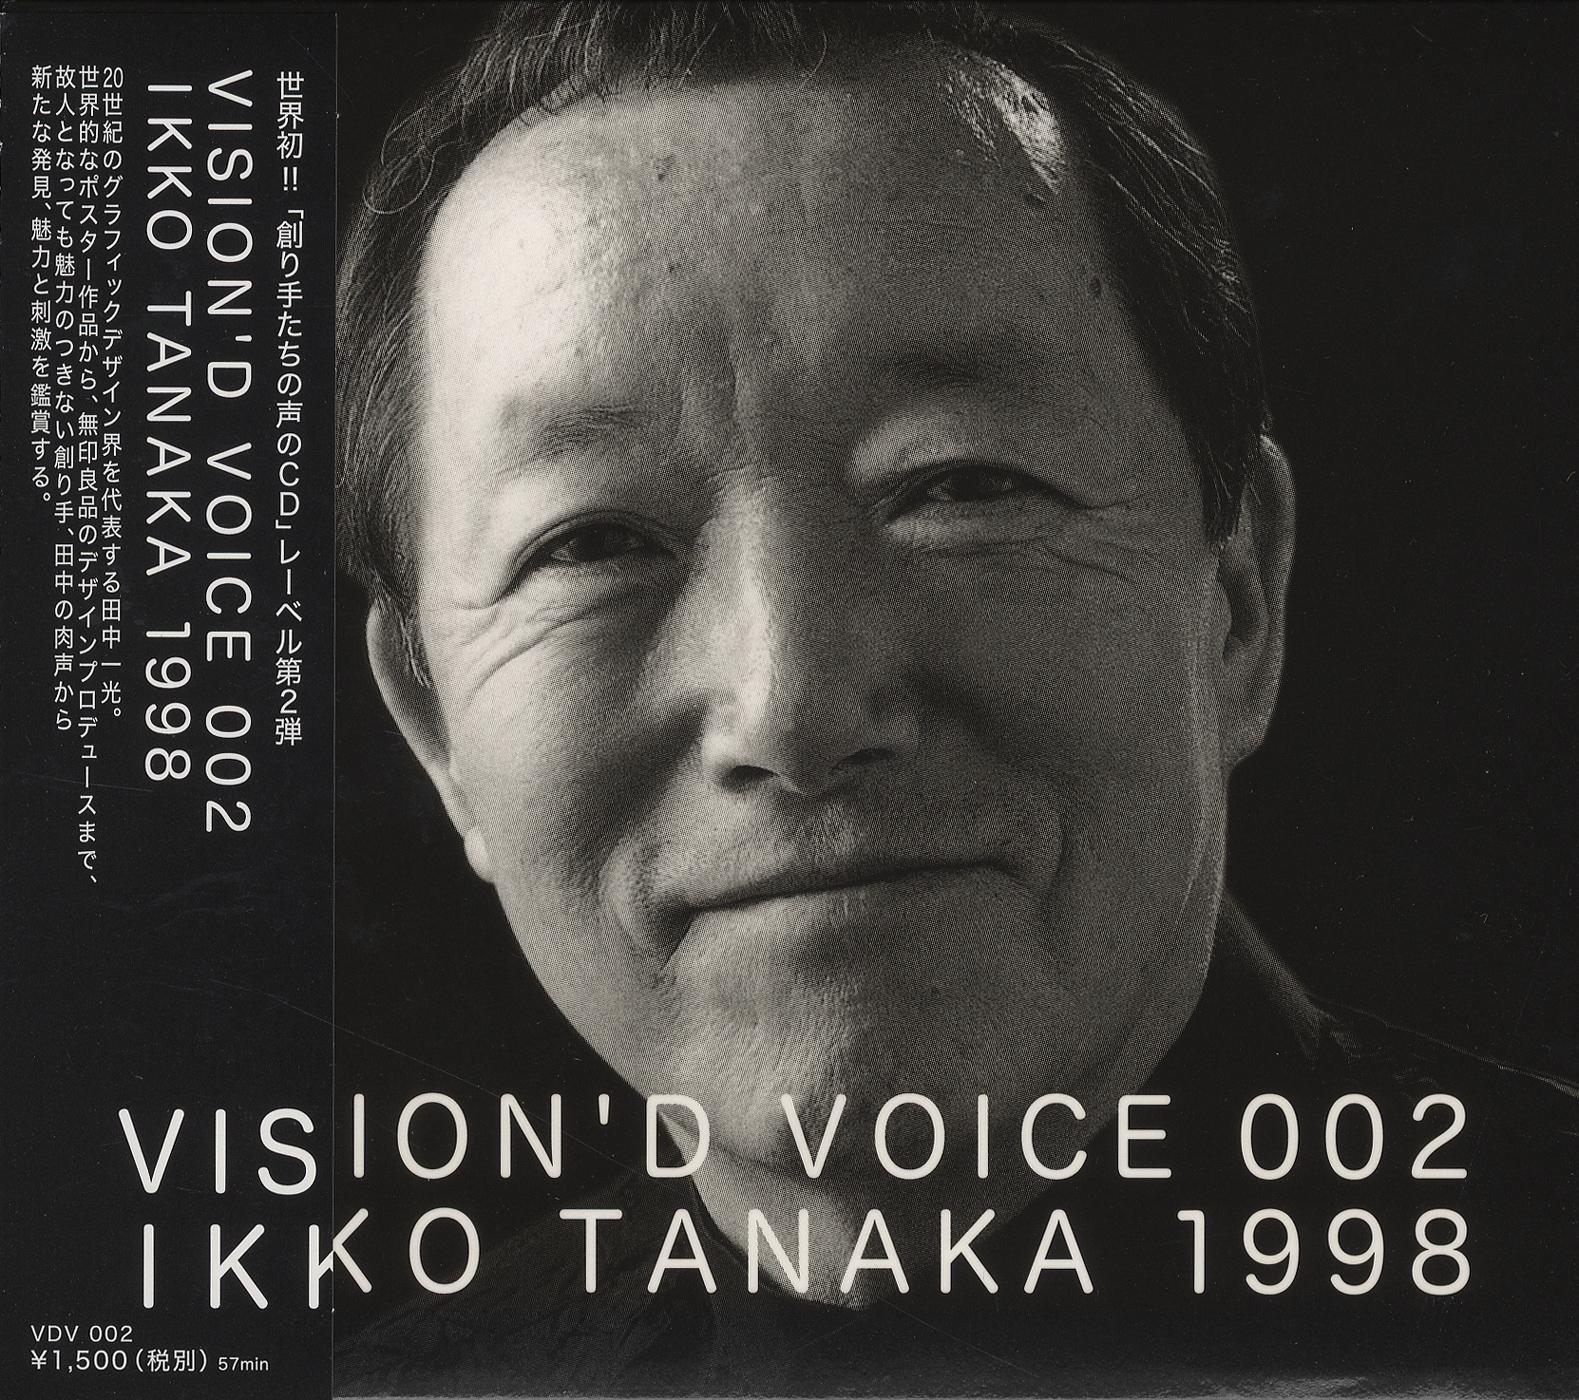 VISION'D VOICE 002 IKKO TANAKA 1998